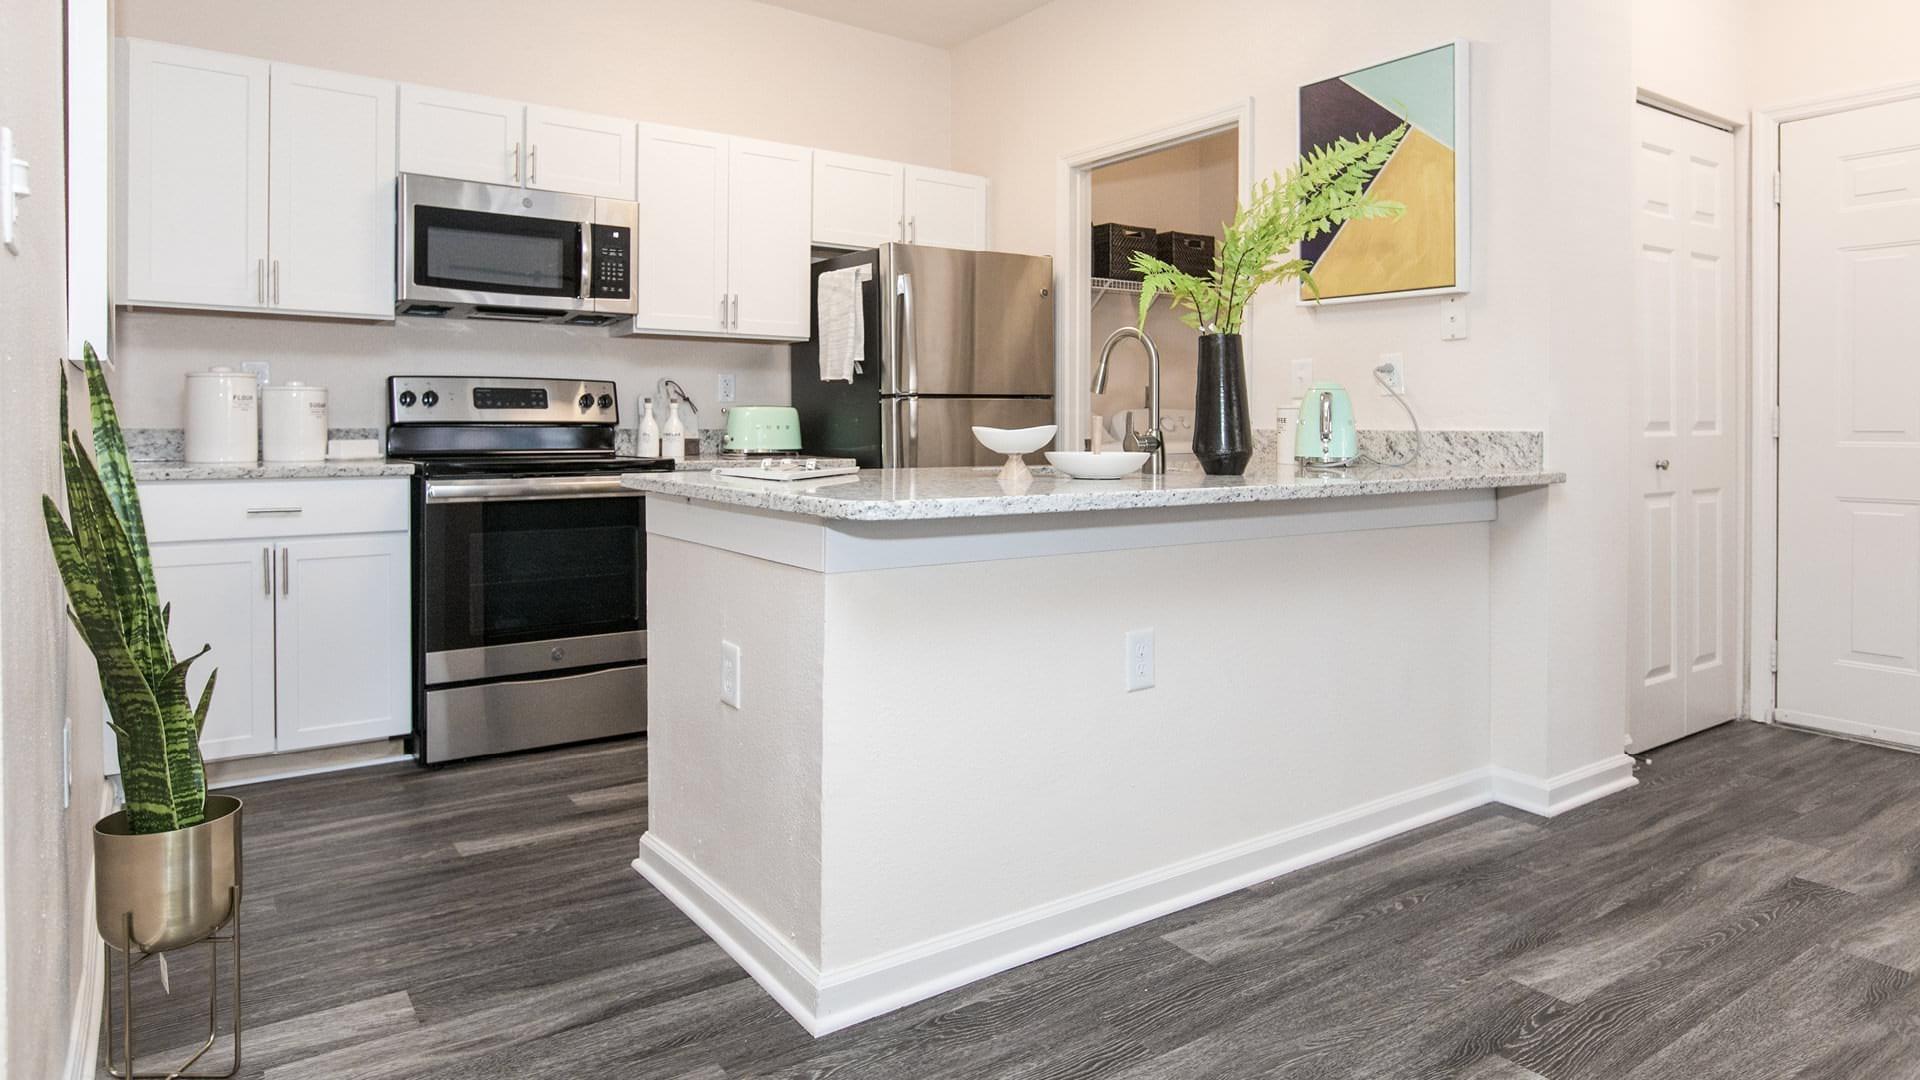 c-shaped kitchen, brightly lit